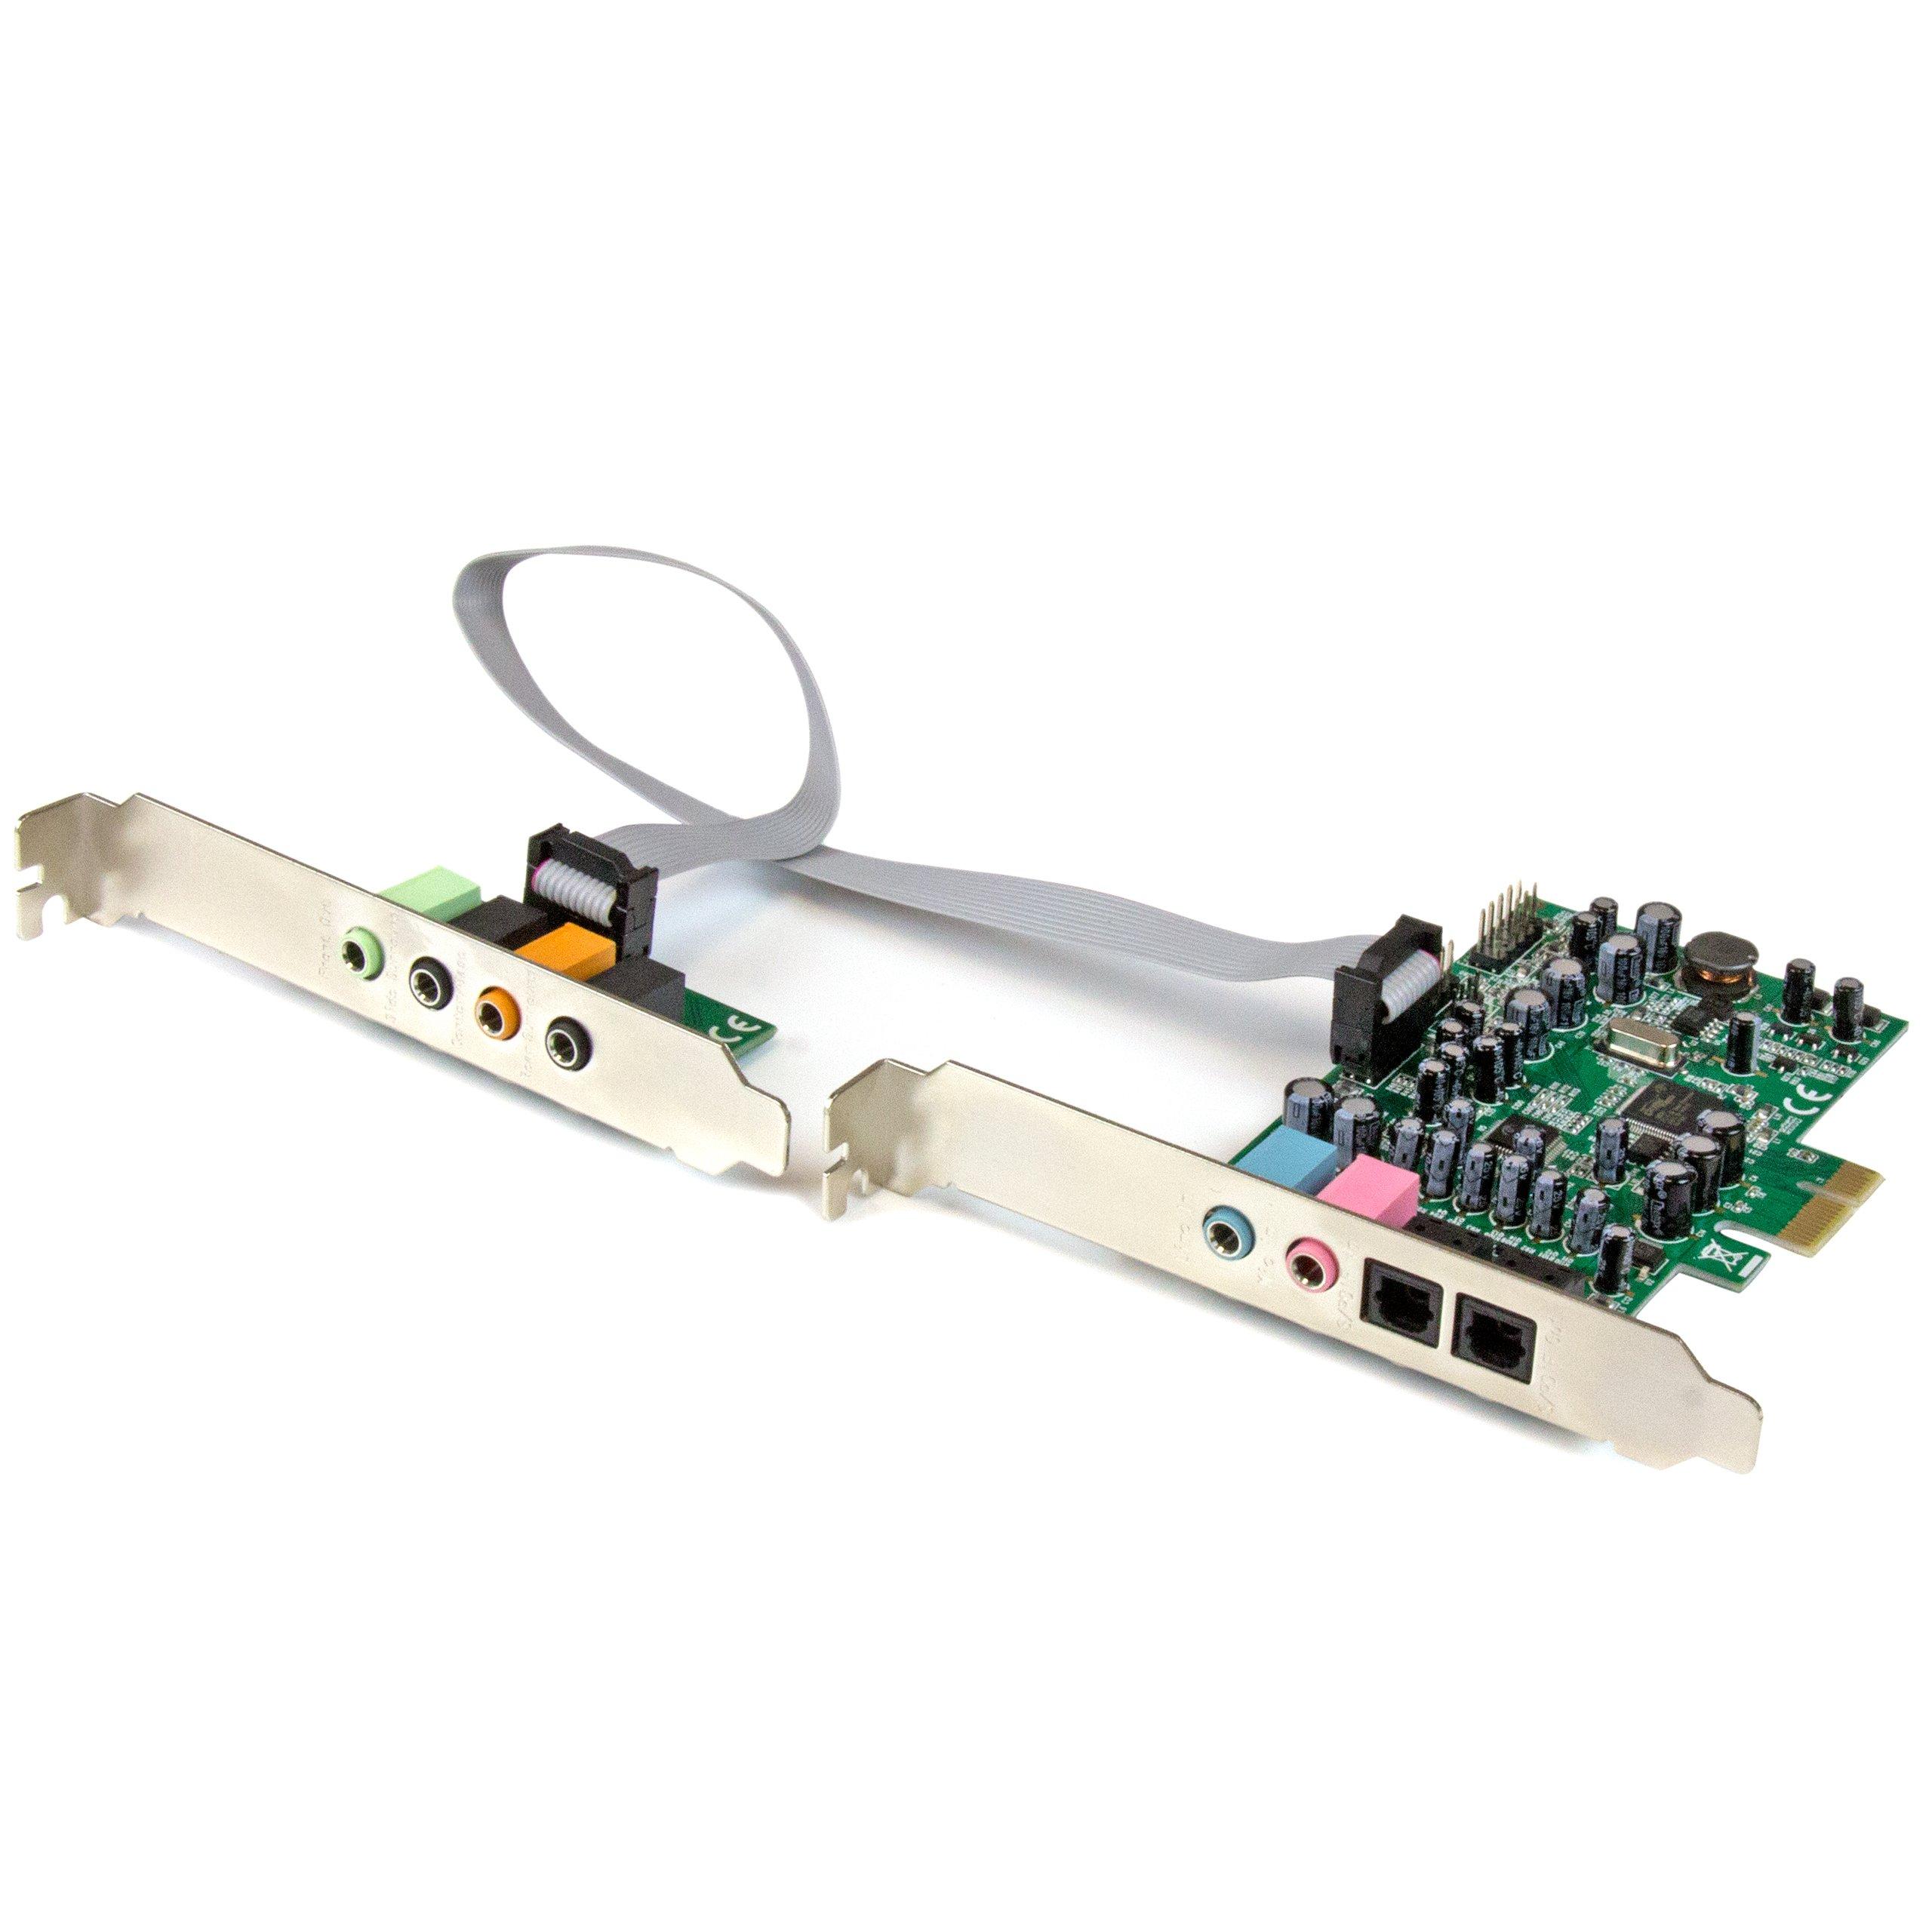 StarTech 7.1 Channel Sound Card - PCI Express - 24-bit - 192KHz - SPDIF Digital Optical and 3.5mm Analog Audio